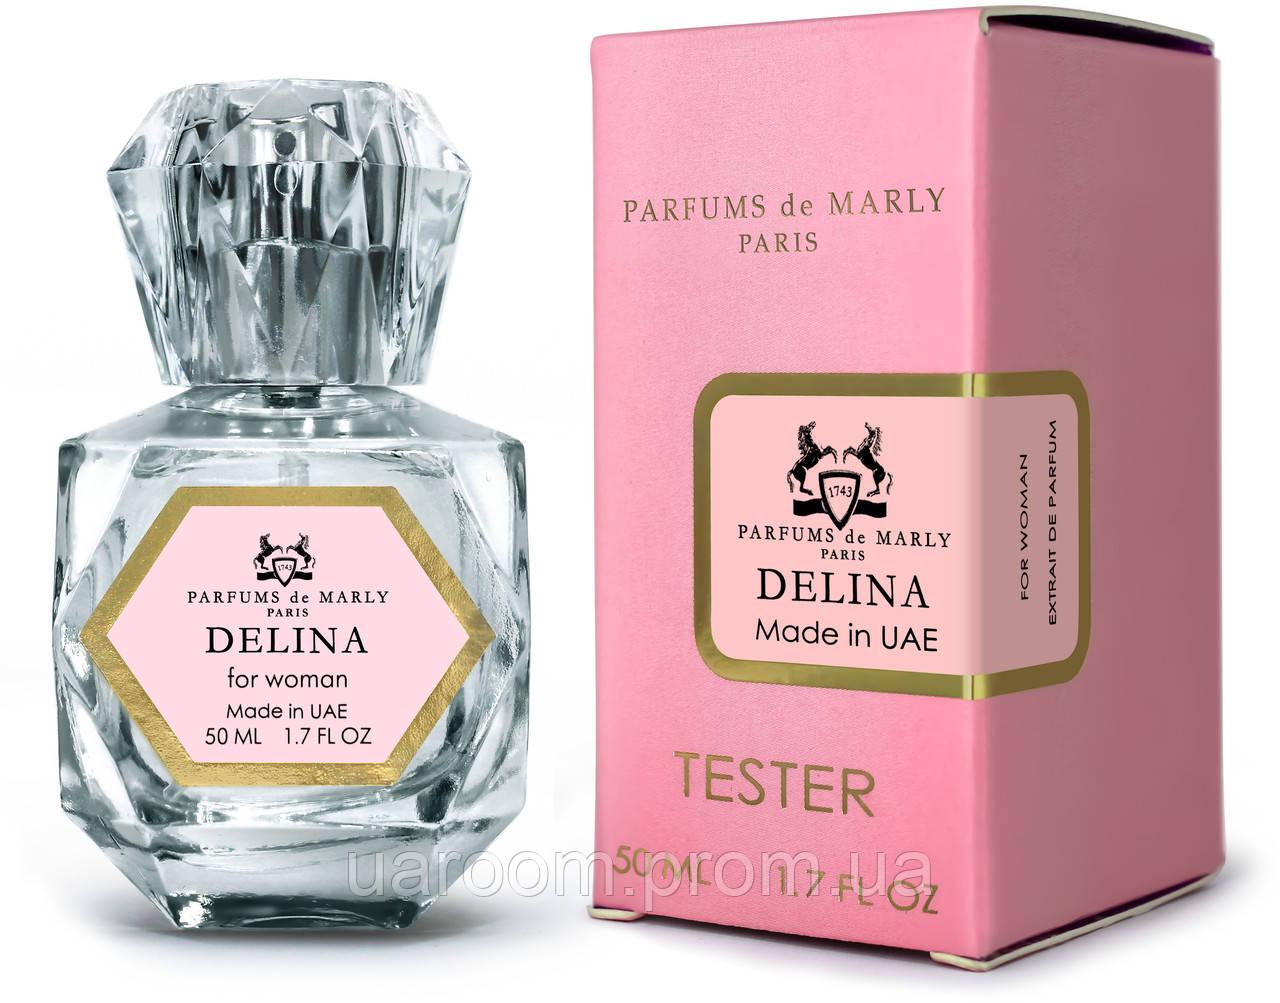 Тестер женский Parfums de Marly Delina, 50 мл.